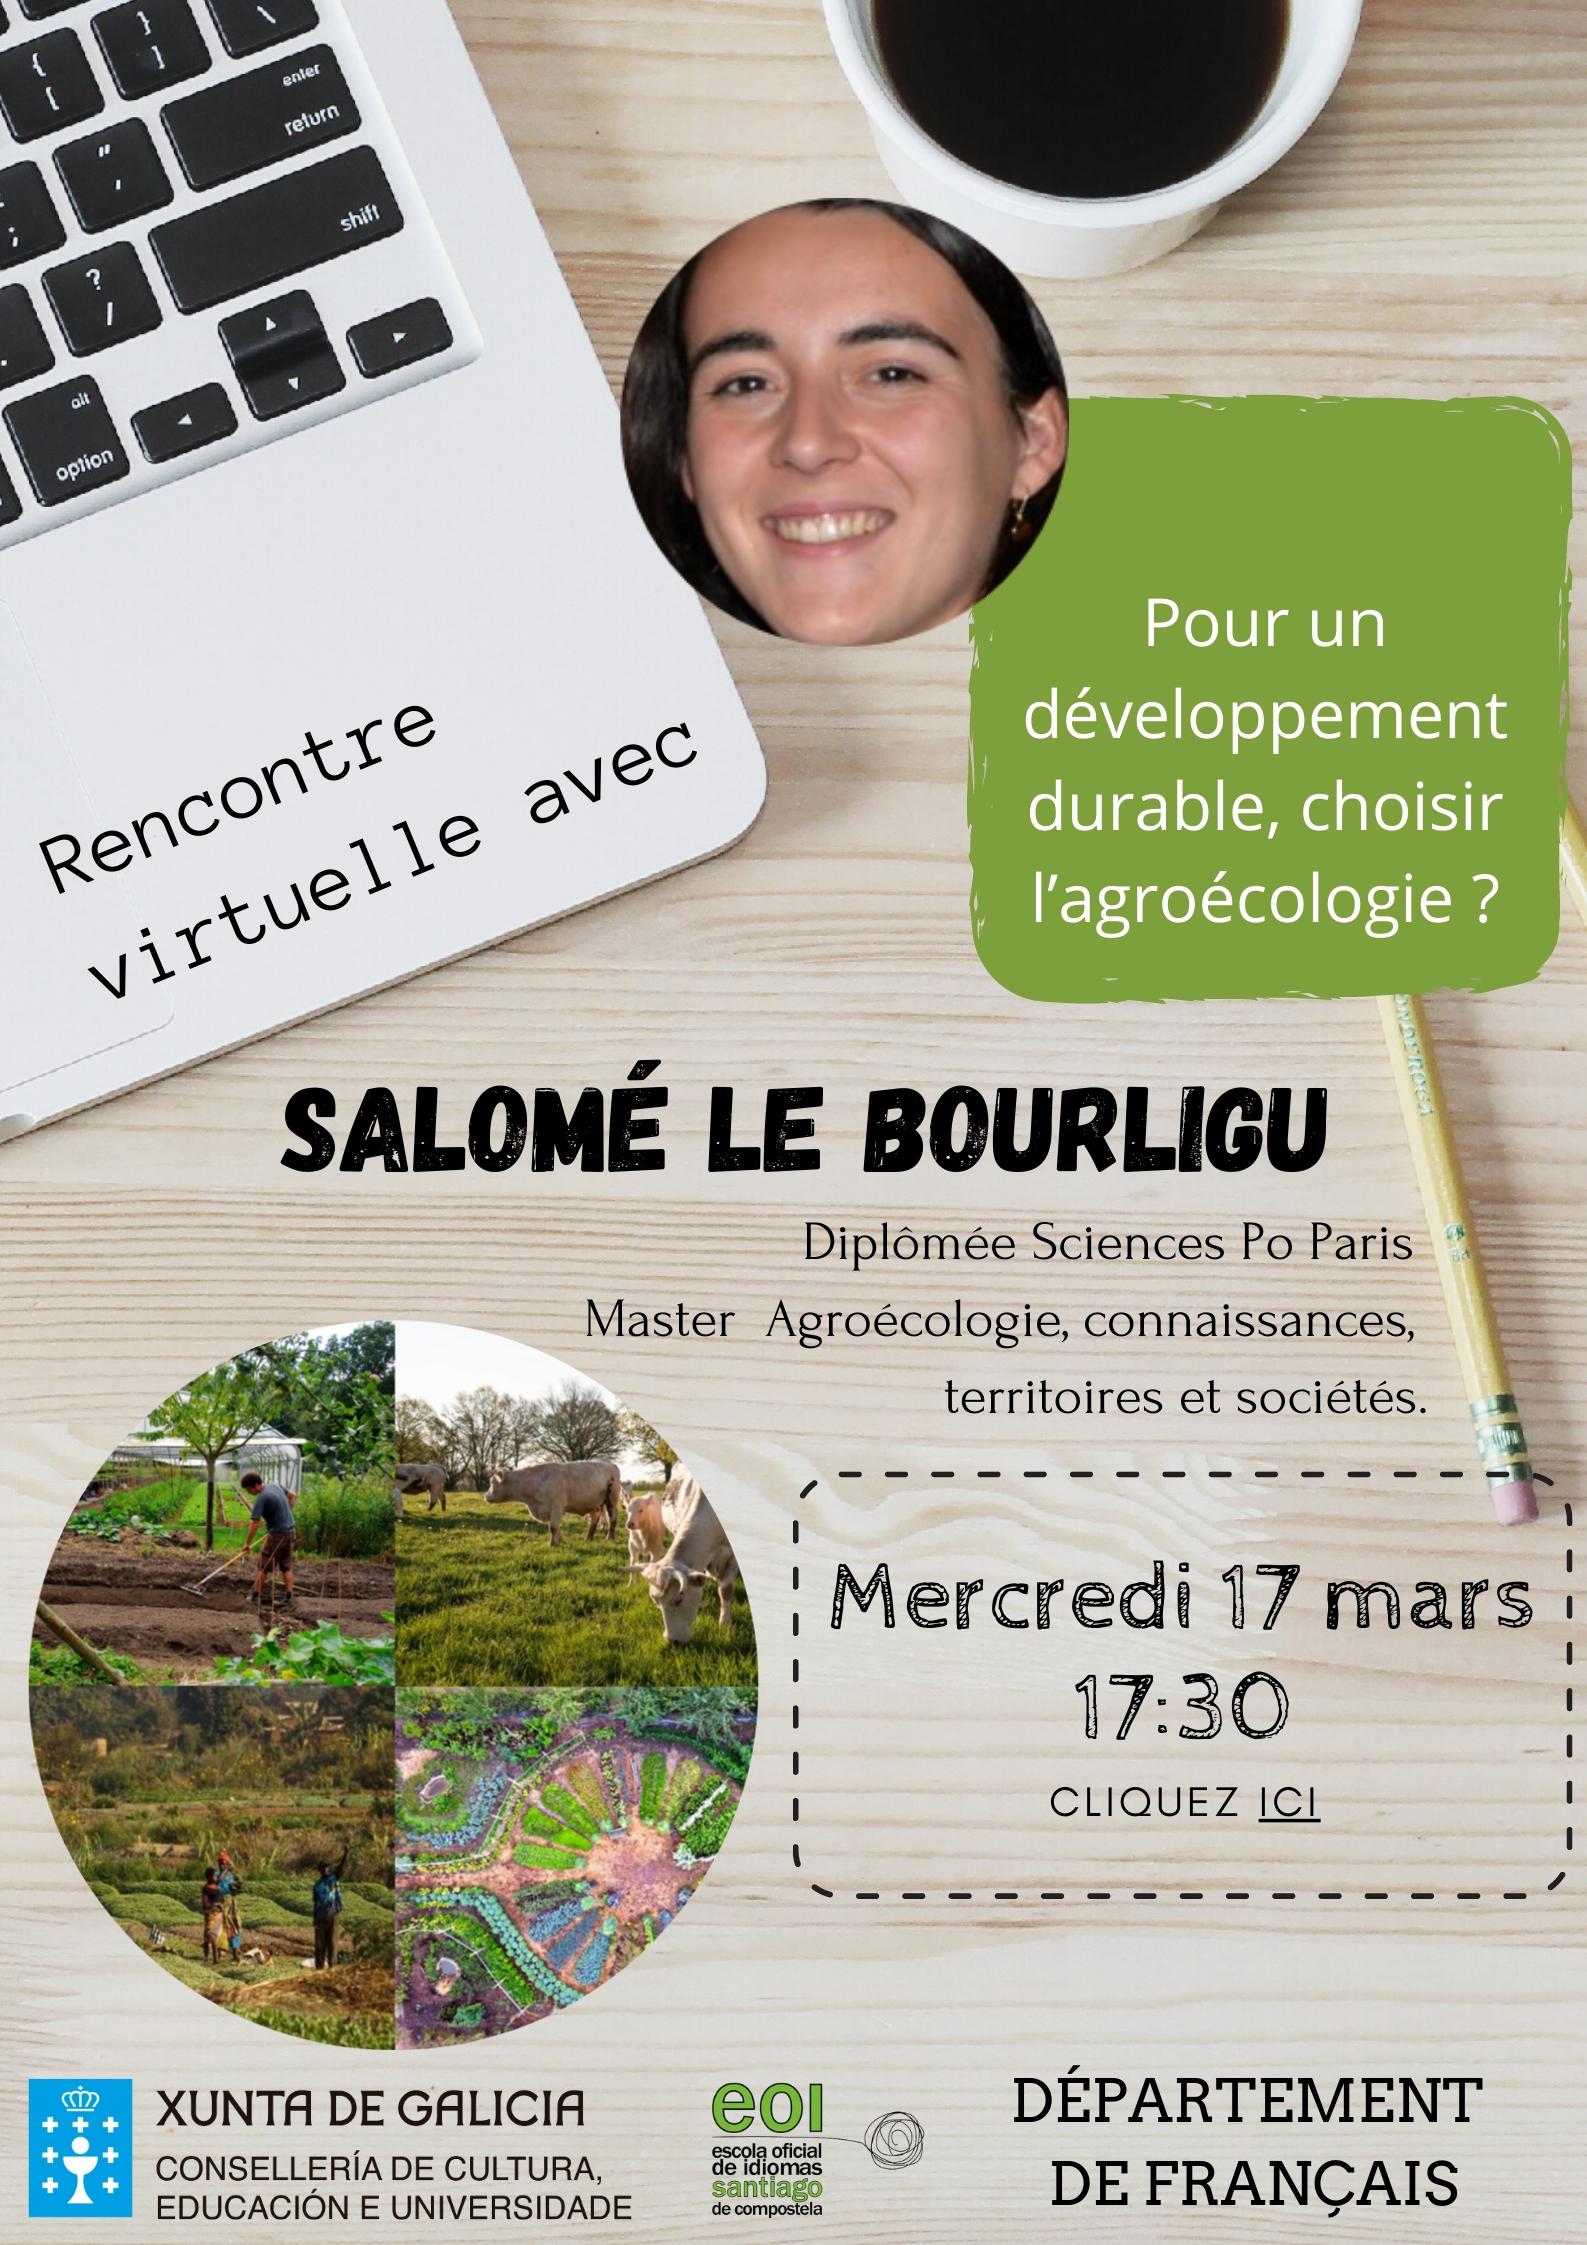 Salomé Le Bourligu